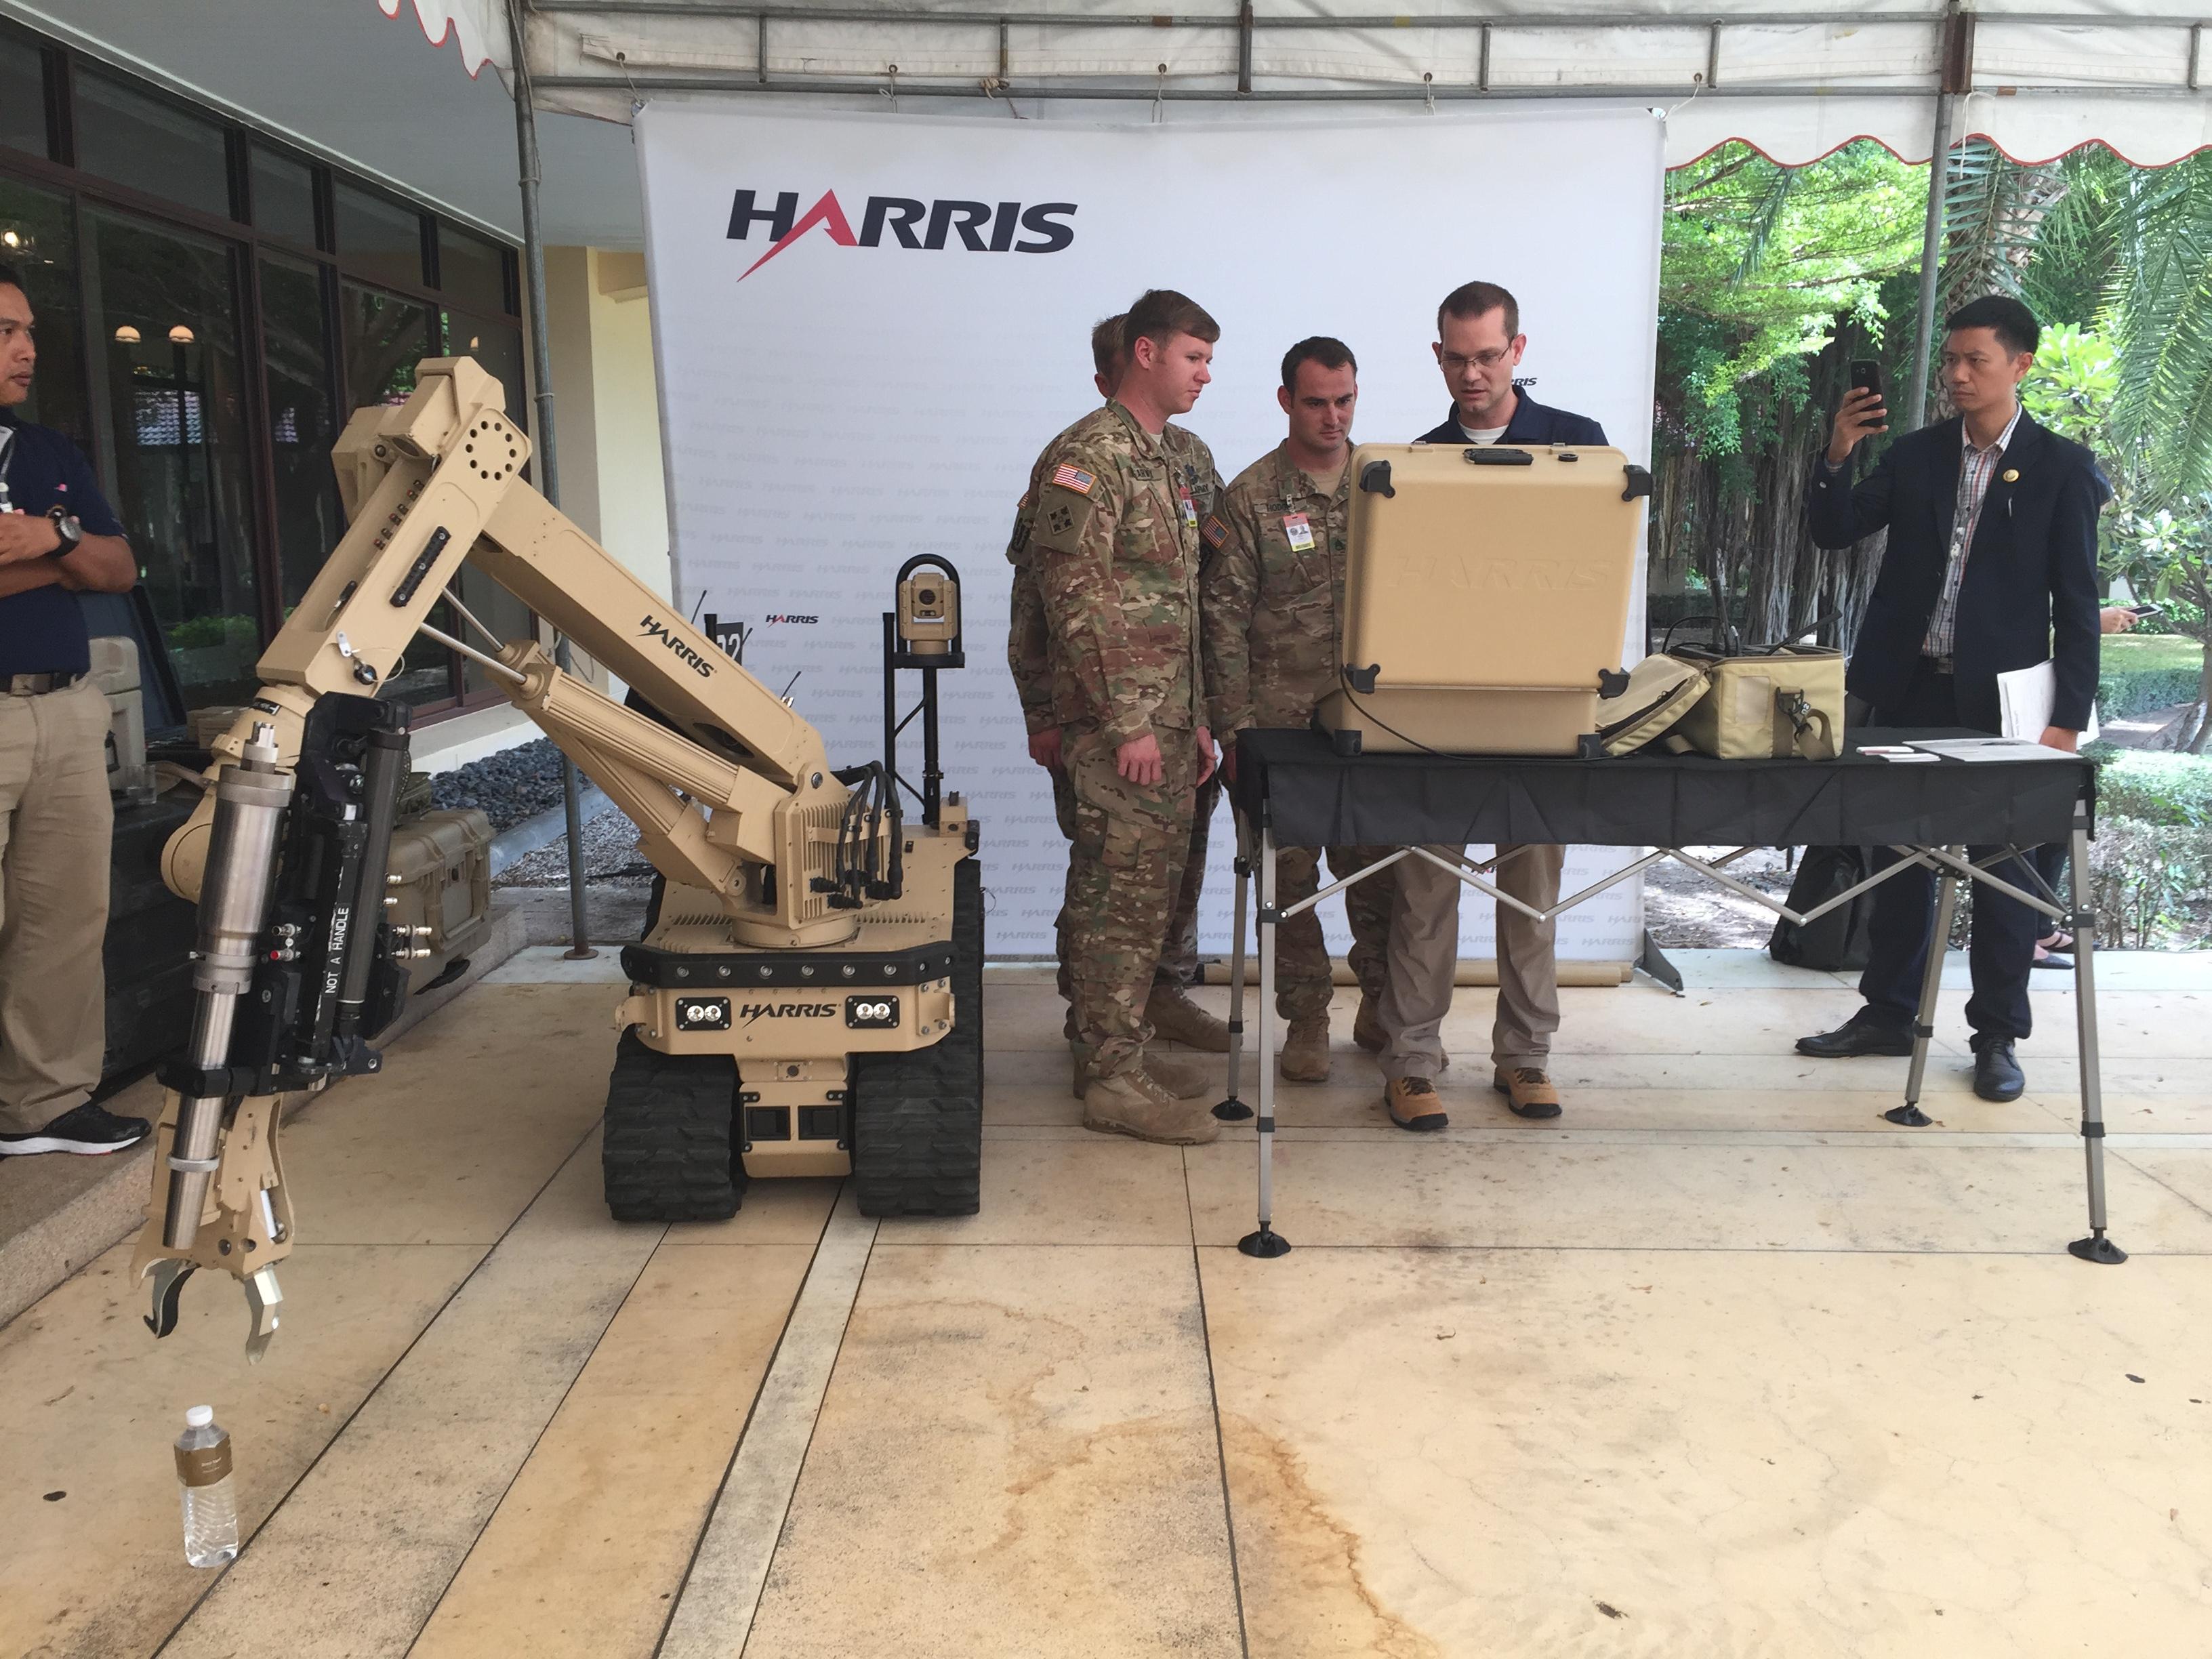 Harris officials demonstrate an explosives disposal system